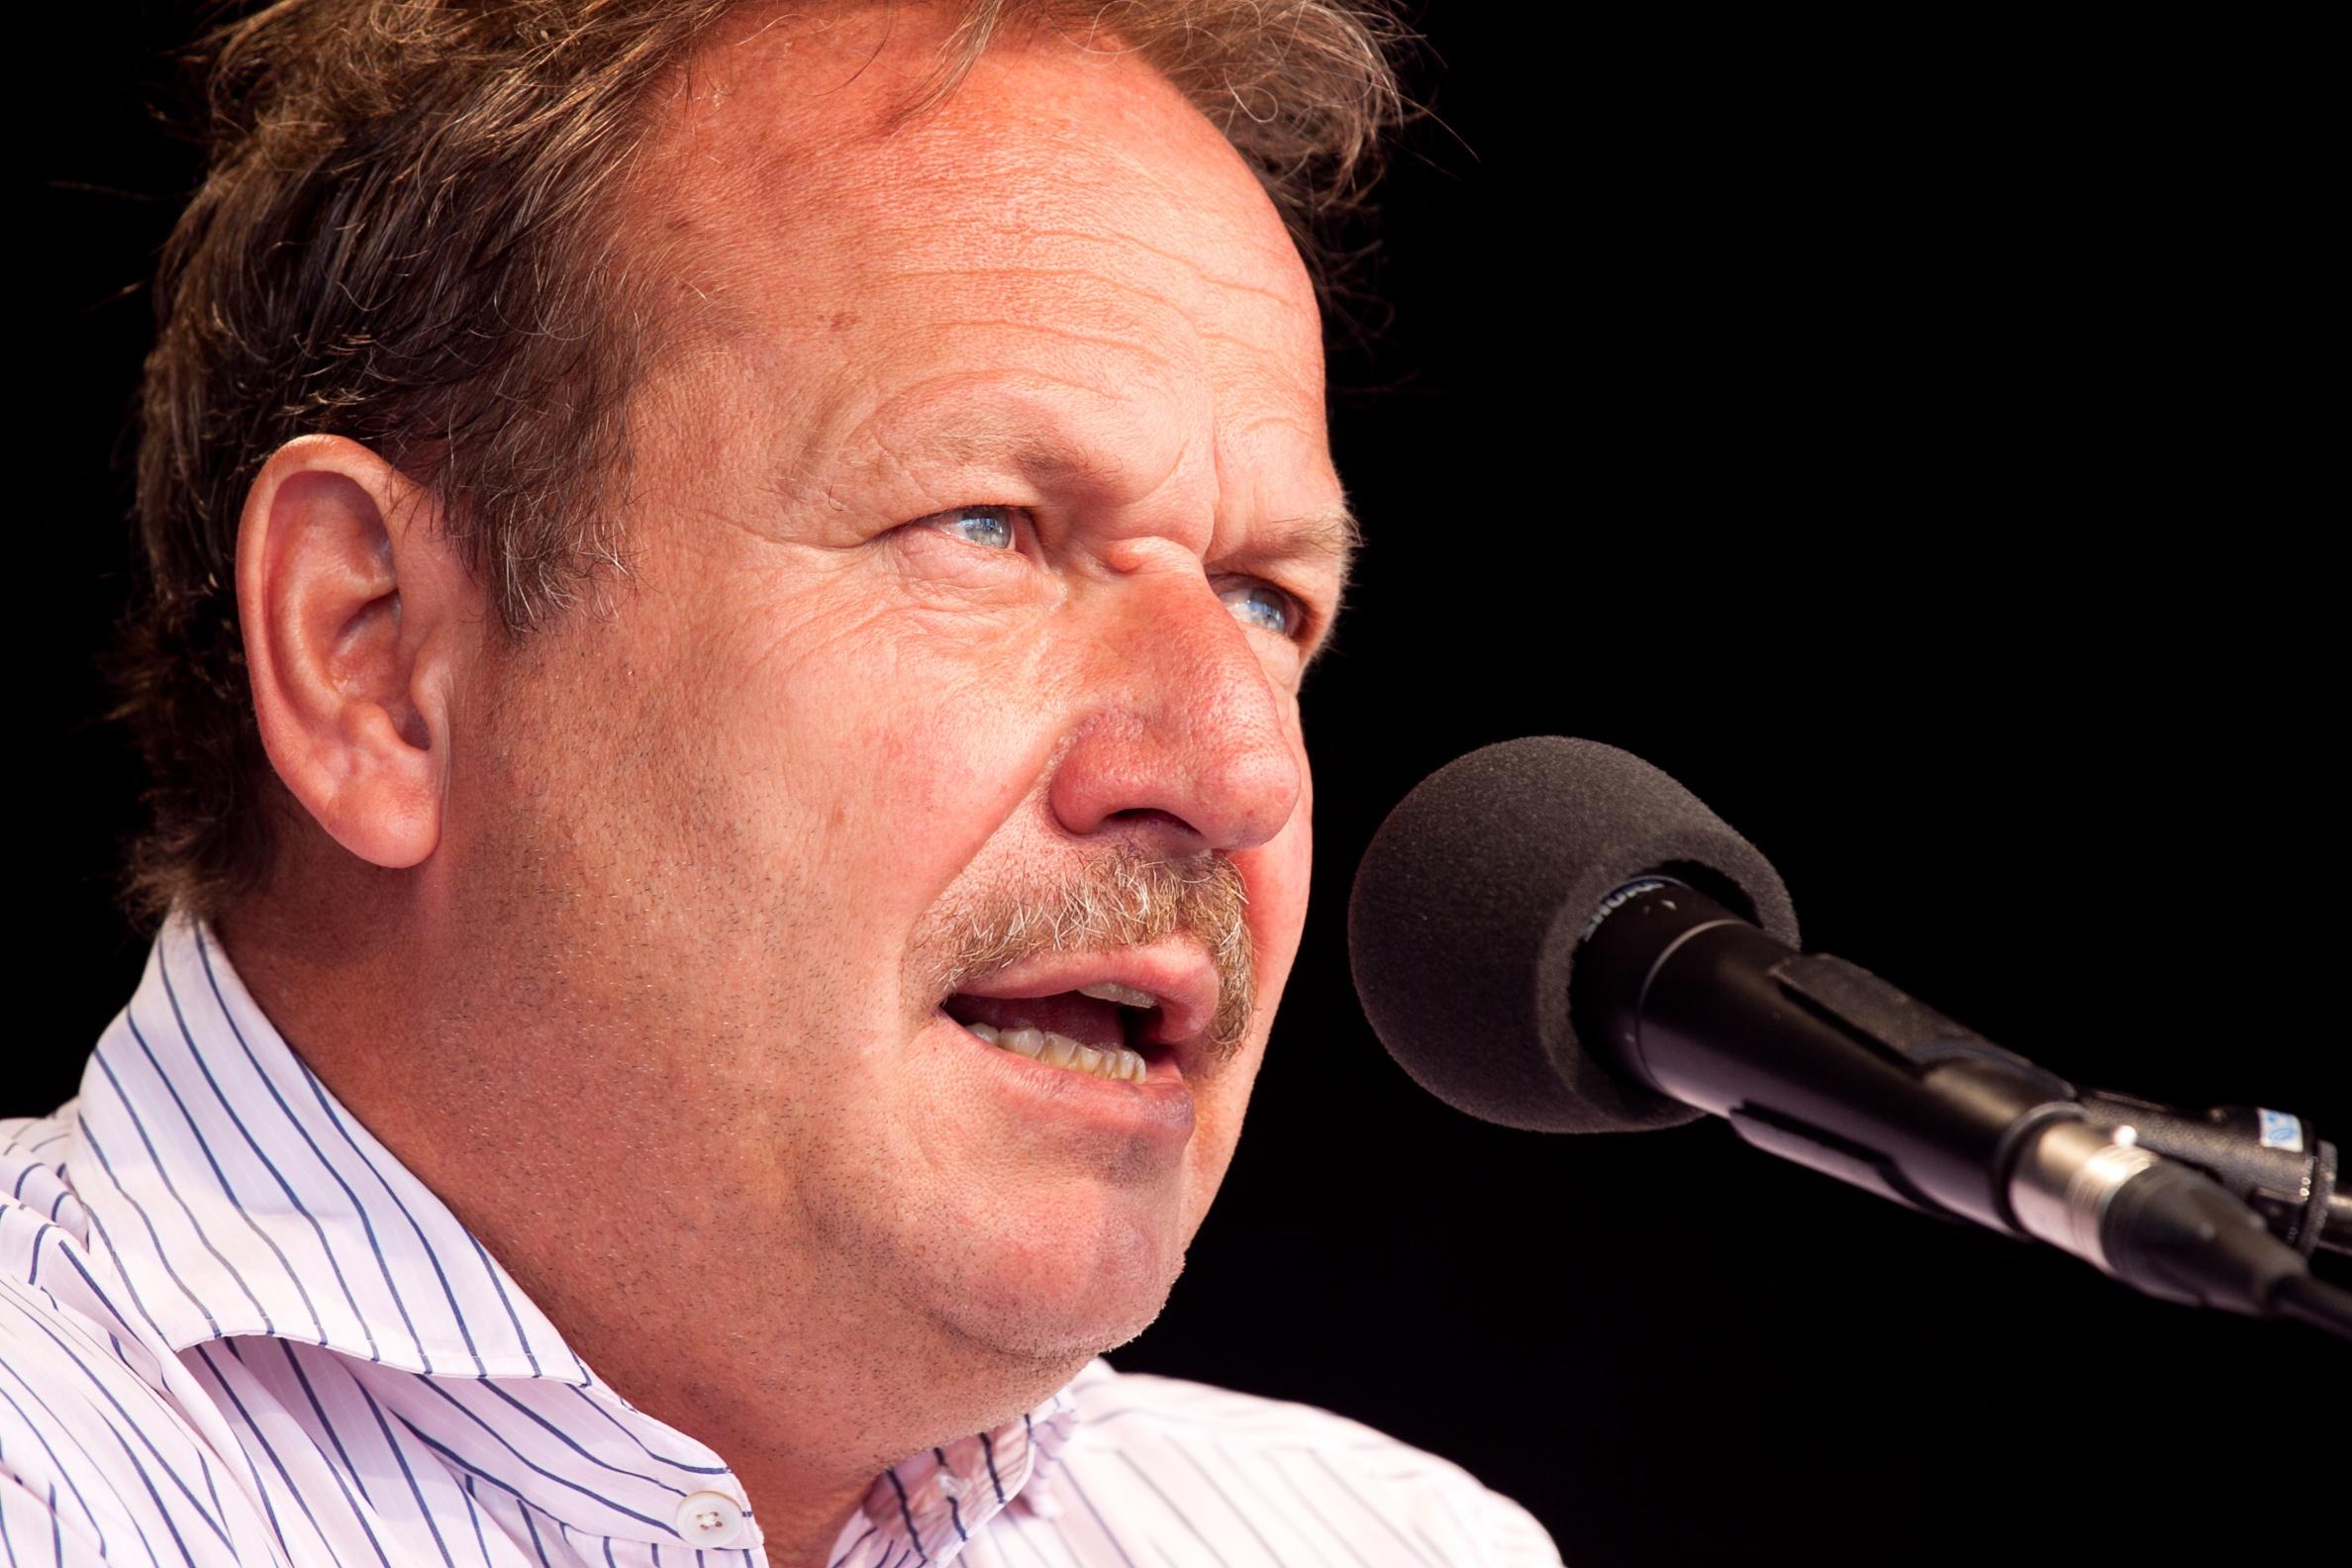 Soll in Berlin als Redner auftreten: Verdi-Chef Frank Bsirske. Foto: Tobias M. Eckric / Wikimedia Commons (CC BY 3.0)